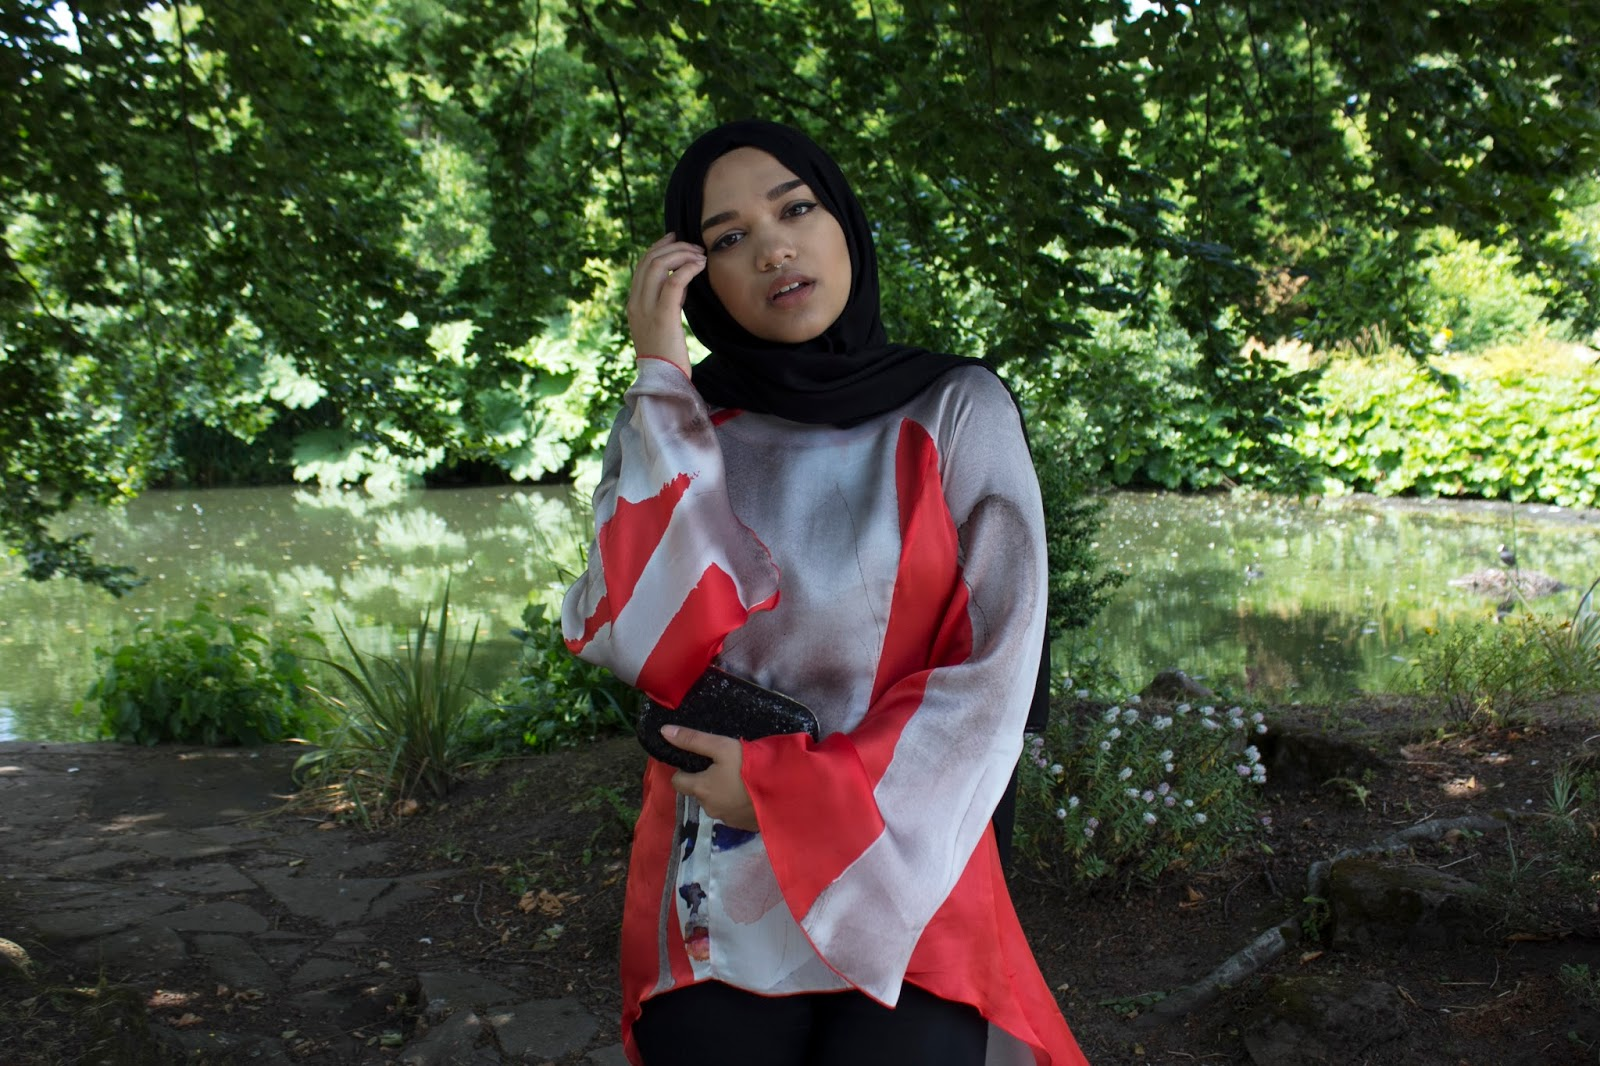 939e42675b8a Scarf - Al-Madina Hijabs | Silk Top - Roddiva Couture | Bag - IDH | Jeans -  Topshop | Heels - New Look